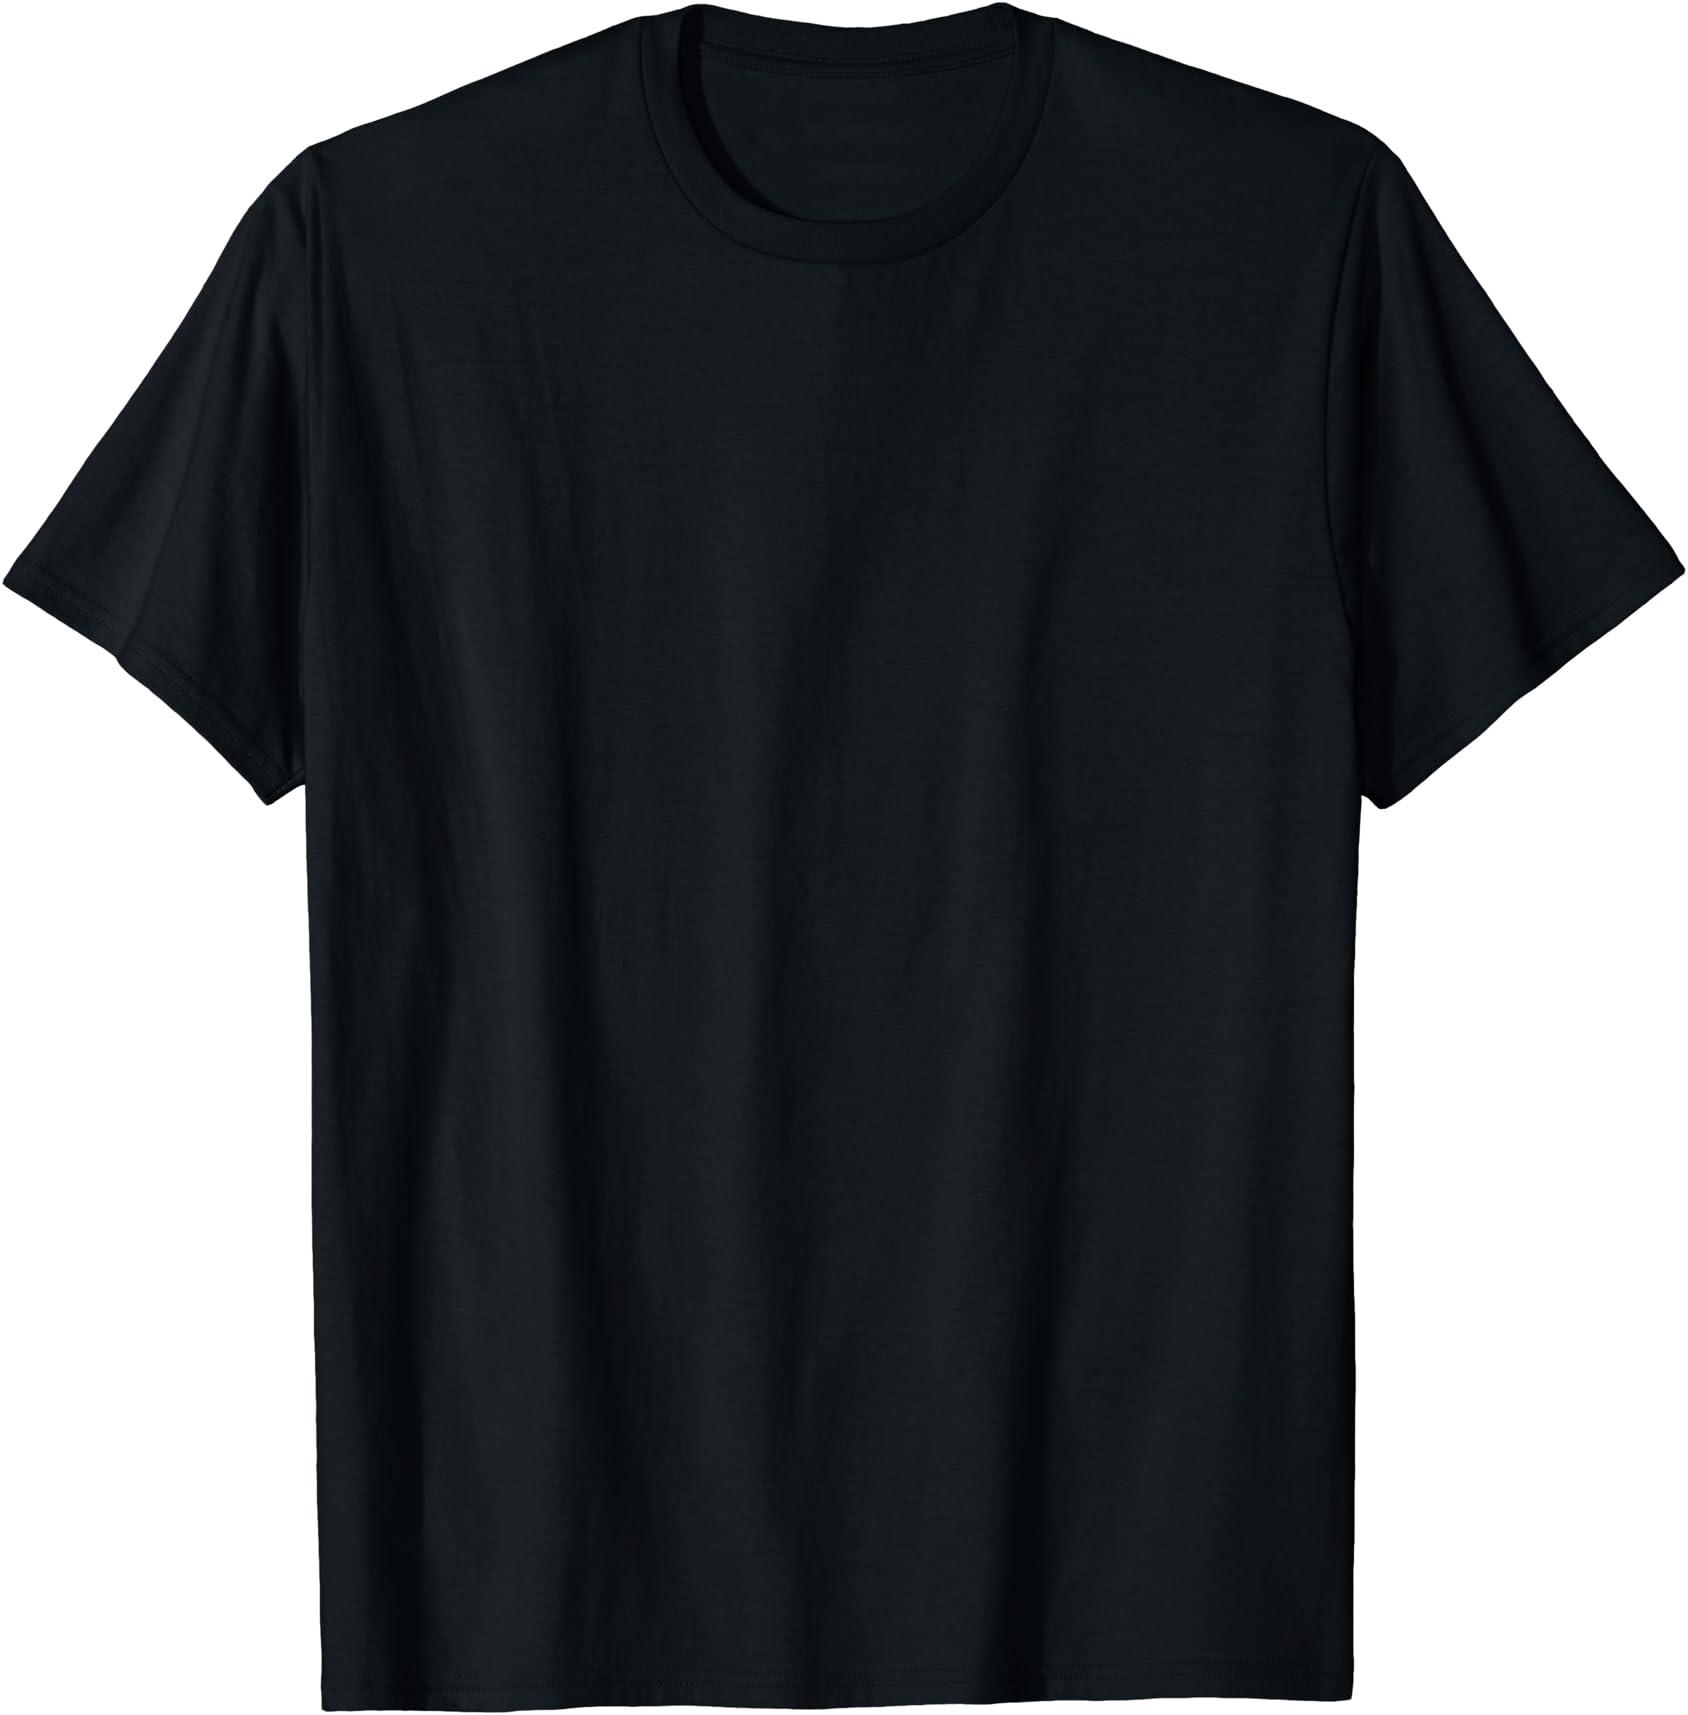 Too Cool For British Rule Shirt Funny George Washington Shirt